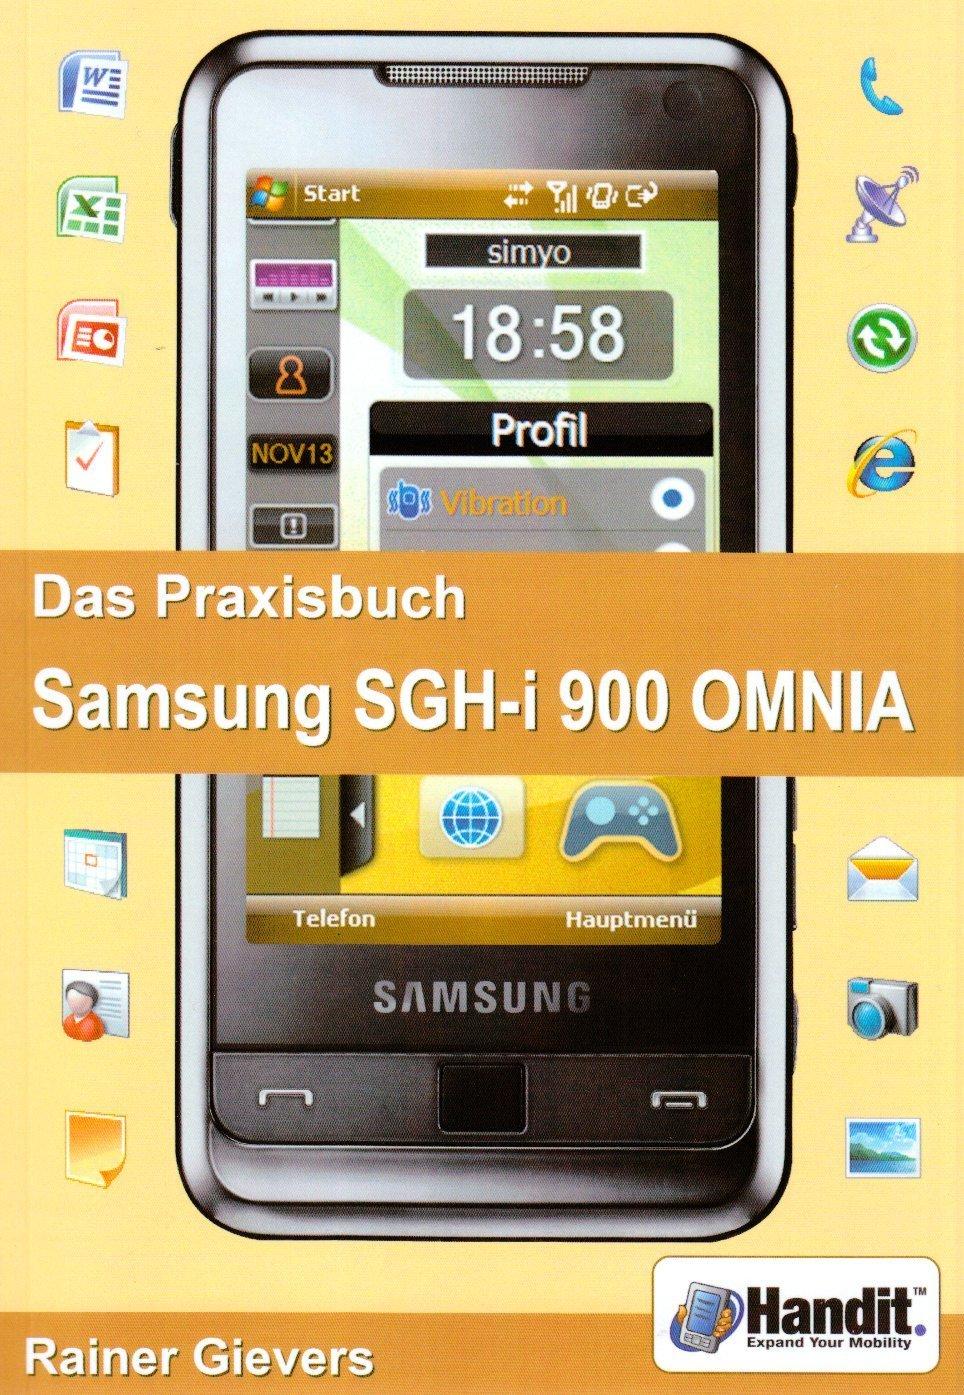 Das Praxisbuch Samsung SGH-i900 OMNIA